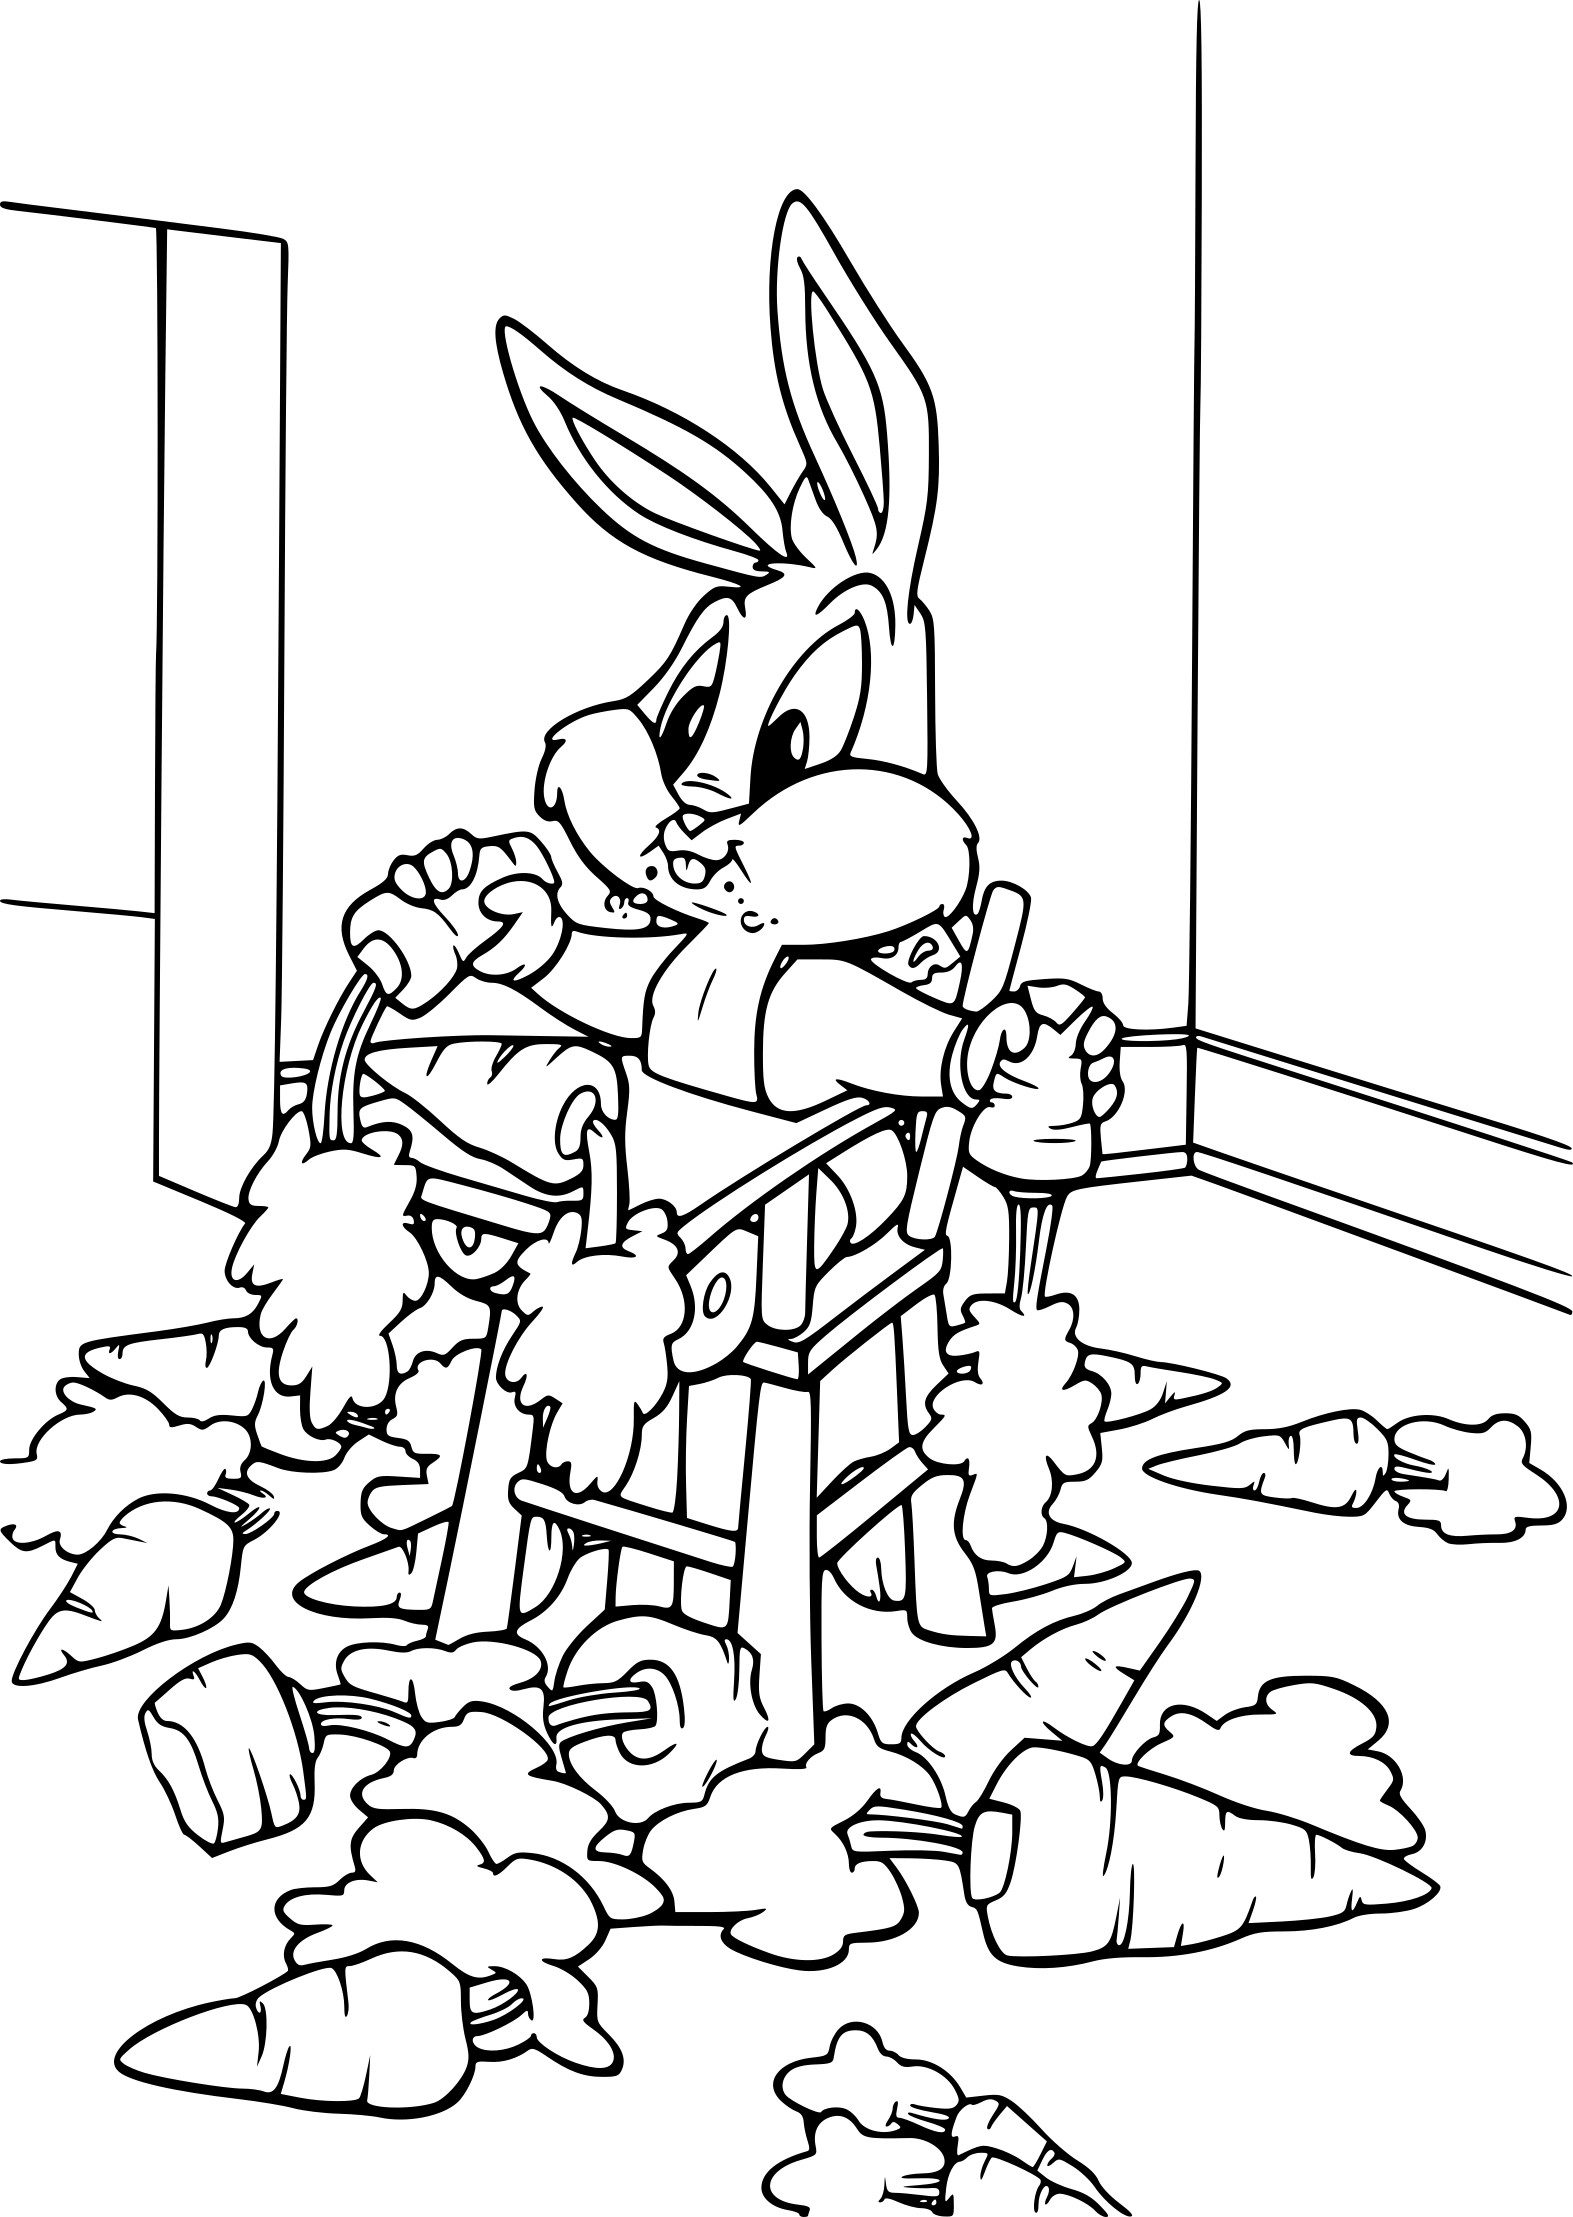 Coloriage bugs bunny mange imprimer - Coloriage bugs bunny a imprimer ...